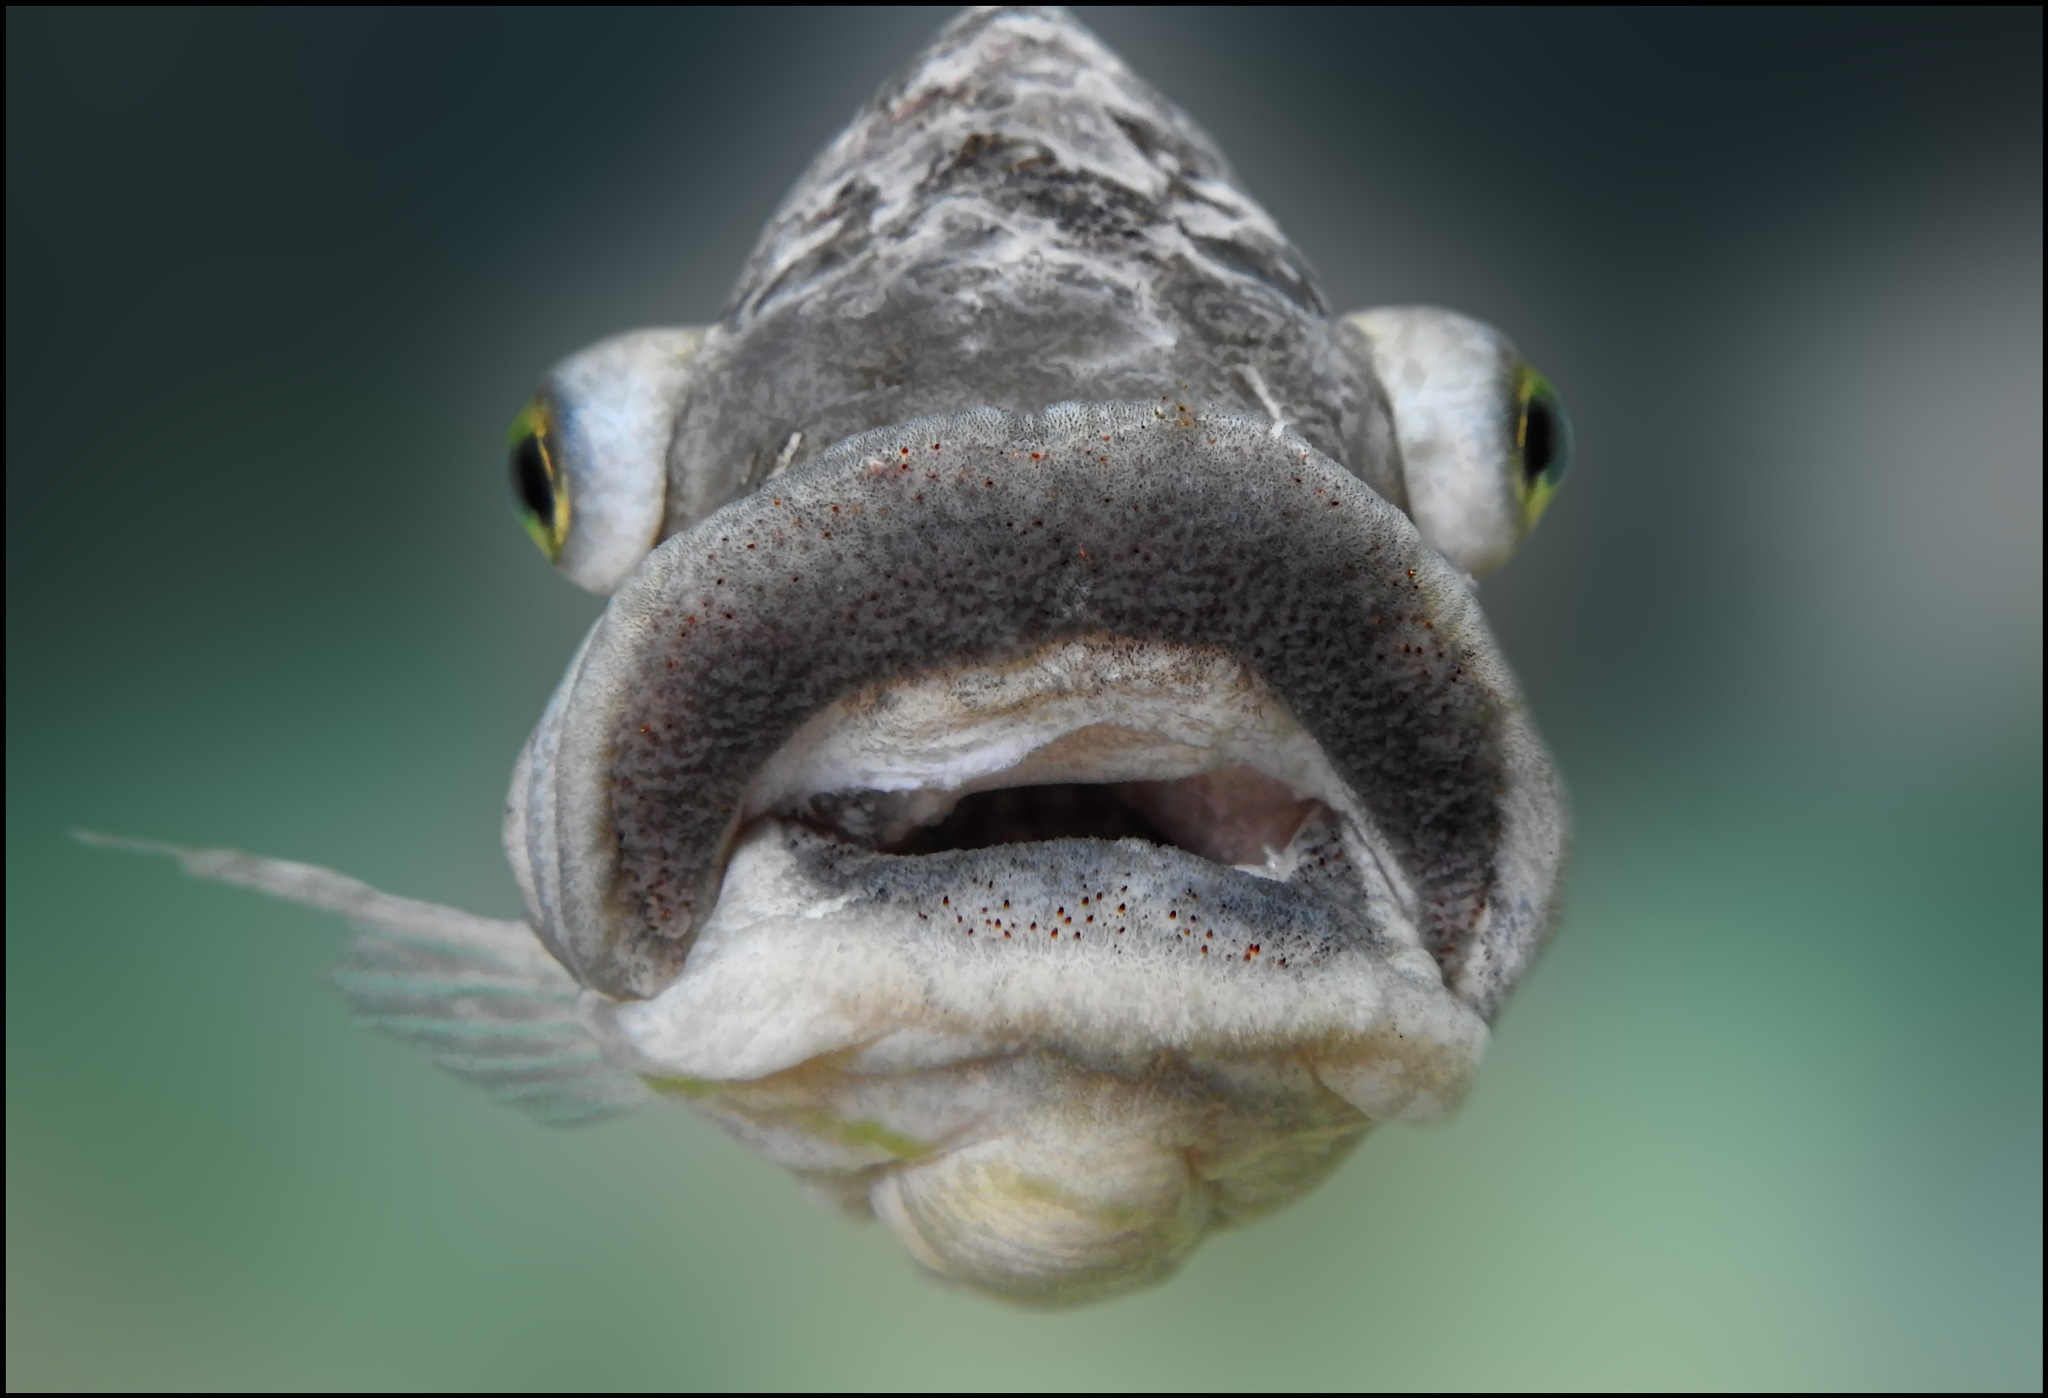 strange fish in the water by karin.kremers.5